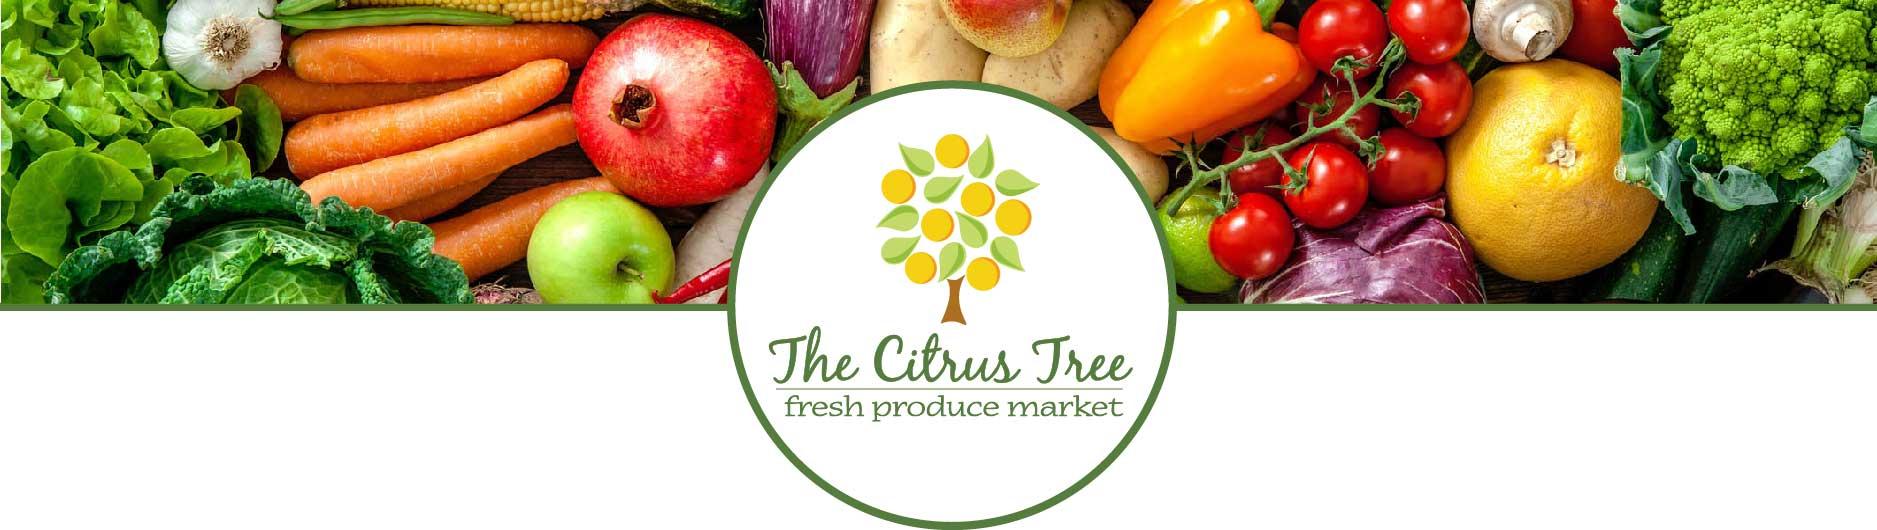 Cincinnati Fruits and Vegetables